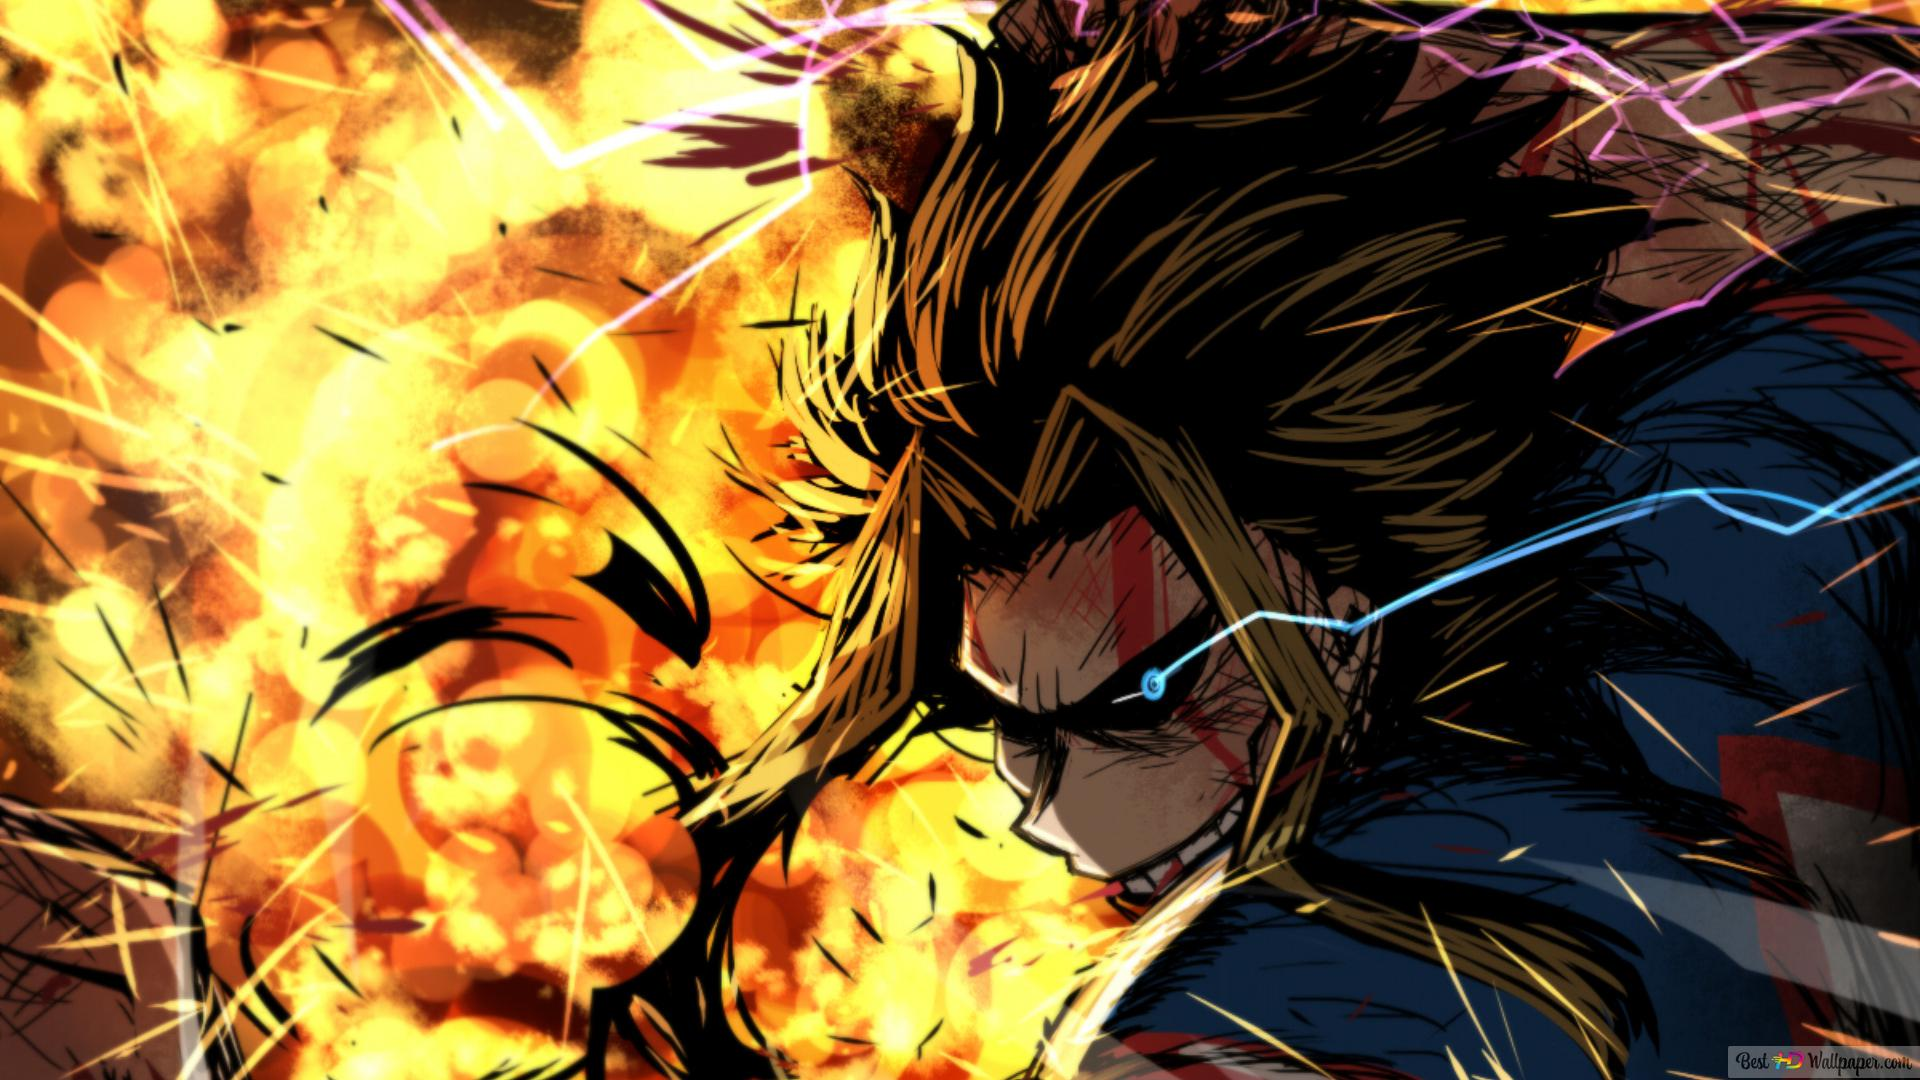 Toshinori Yagi - My Hero Academia HD wallpaper download